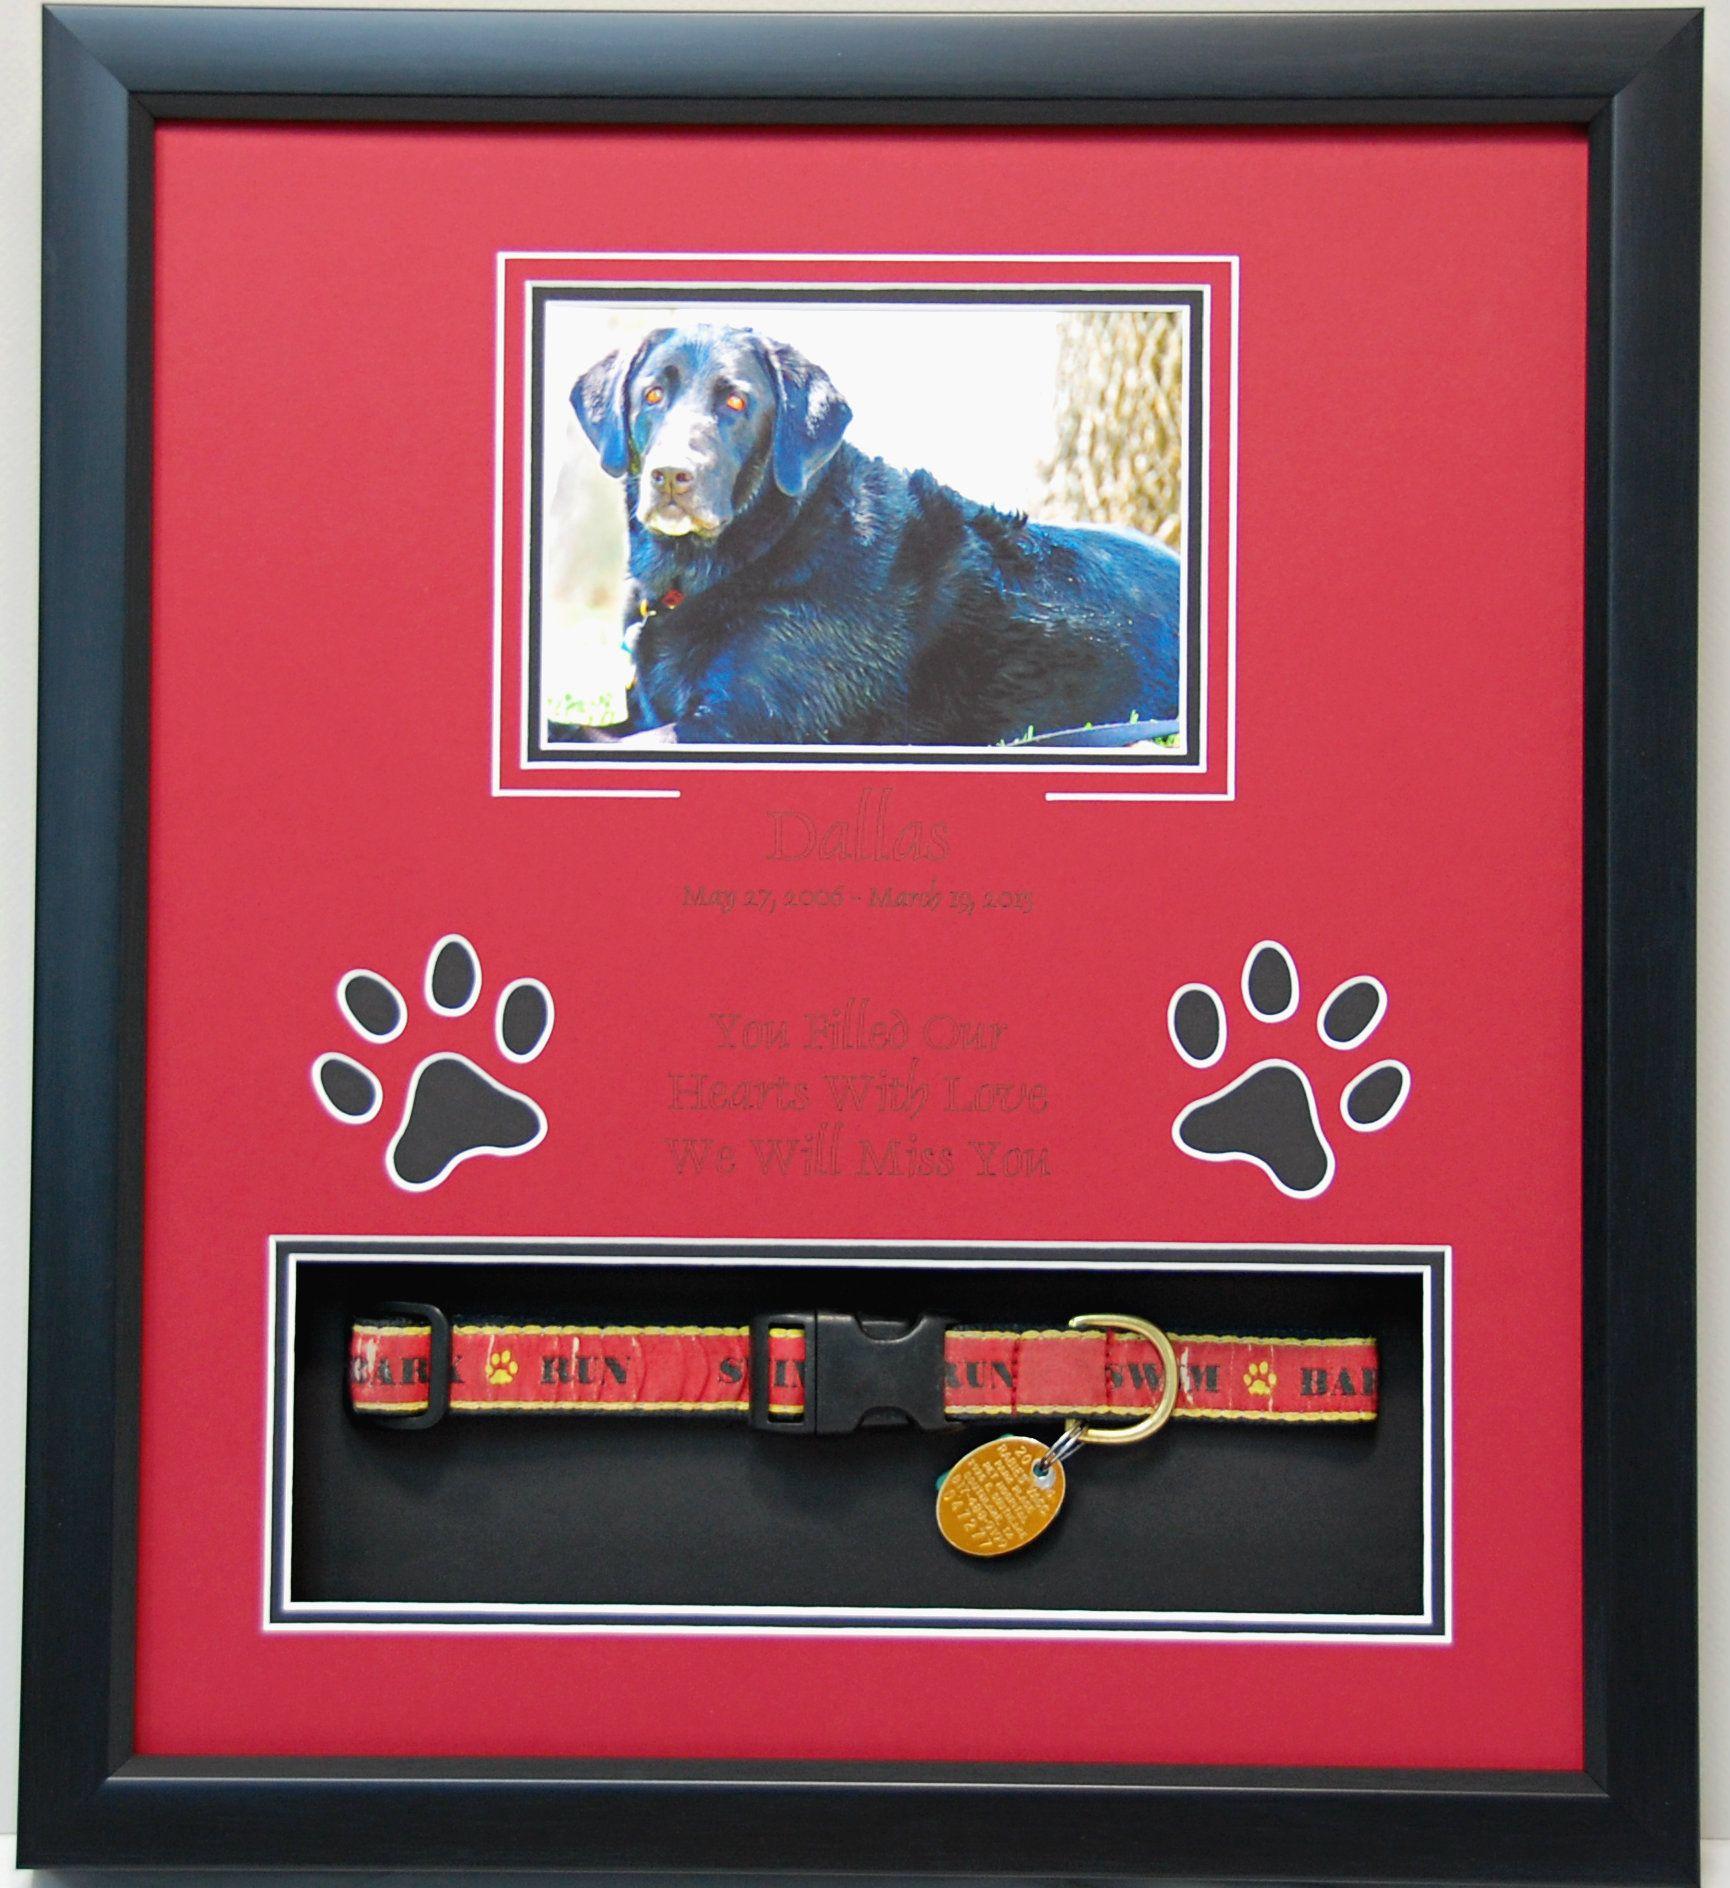 15 X 17 Pet Memorial Shadow Box Display R I P Dallas You Were Loved Every Day Pet Memorials Custom Pet Memorials Pet Memorial Diy